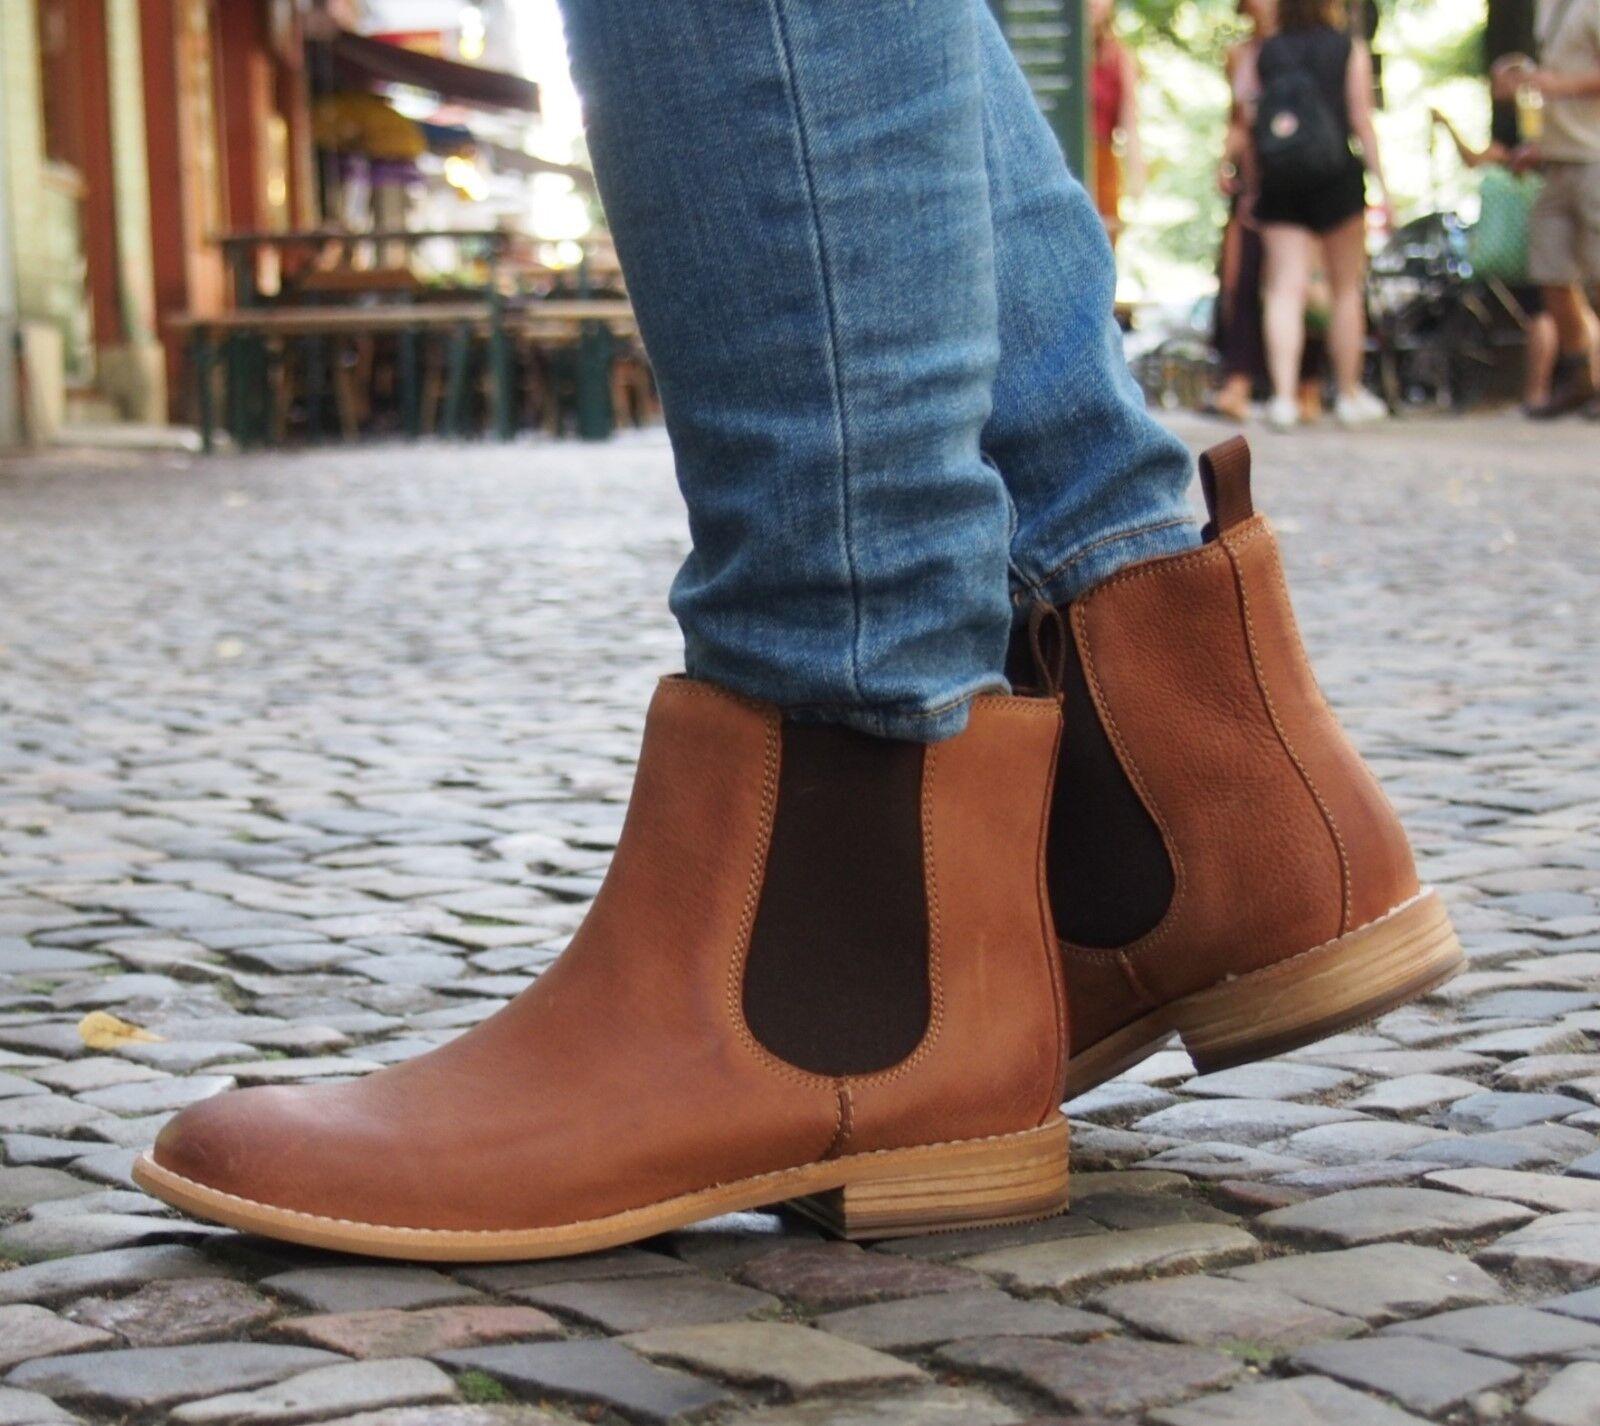 Clarks Schuh MAYPEARL NALA dark tan braun DamenBoot Stiefelette Chelsea Boot NEU